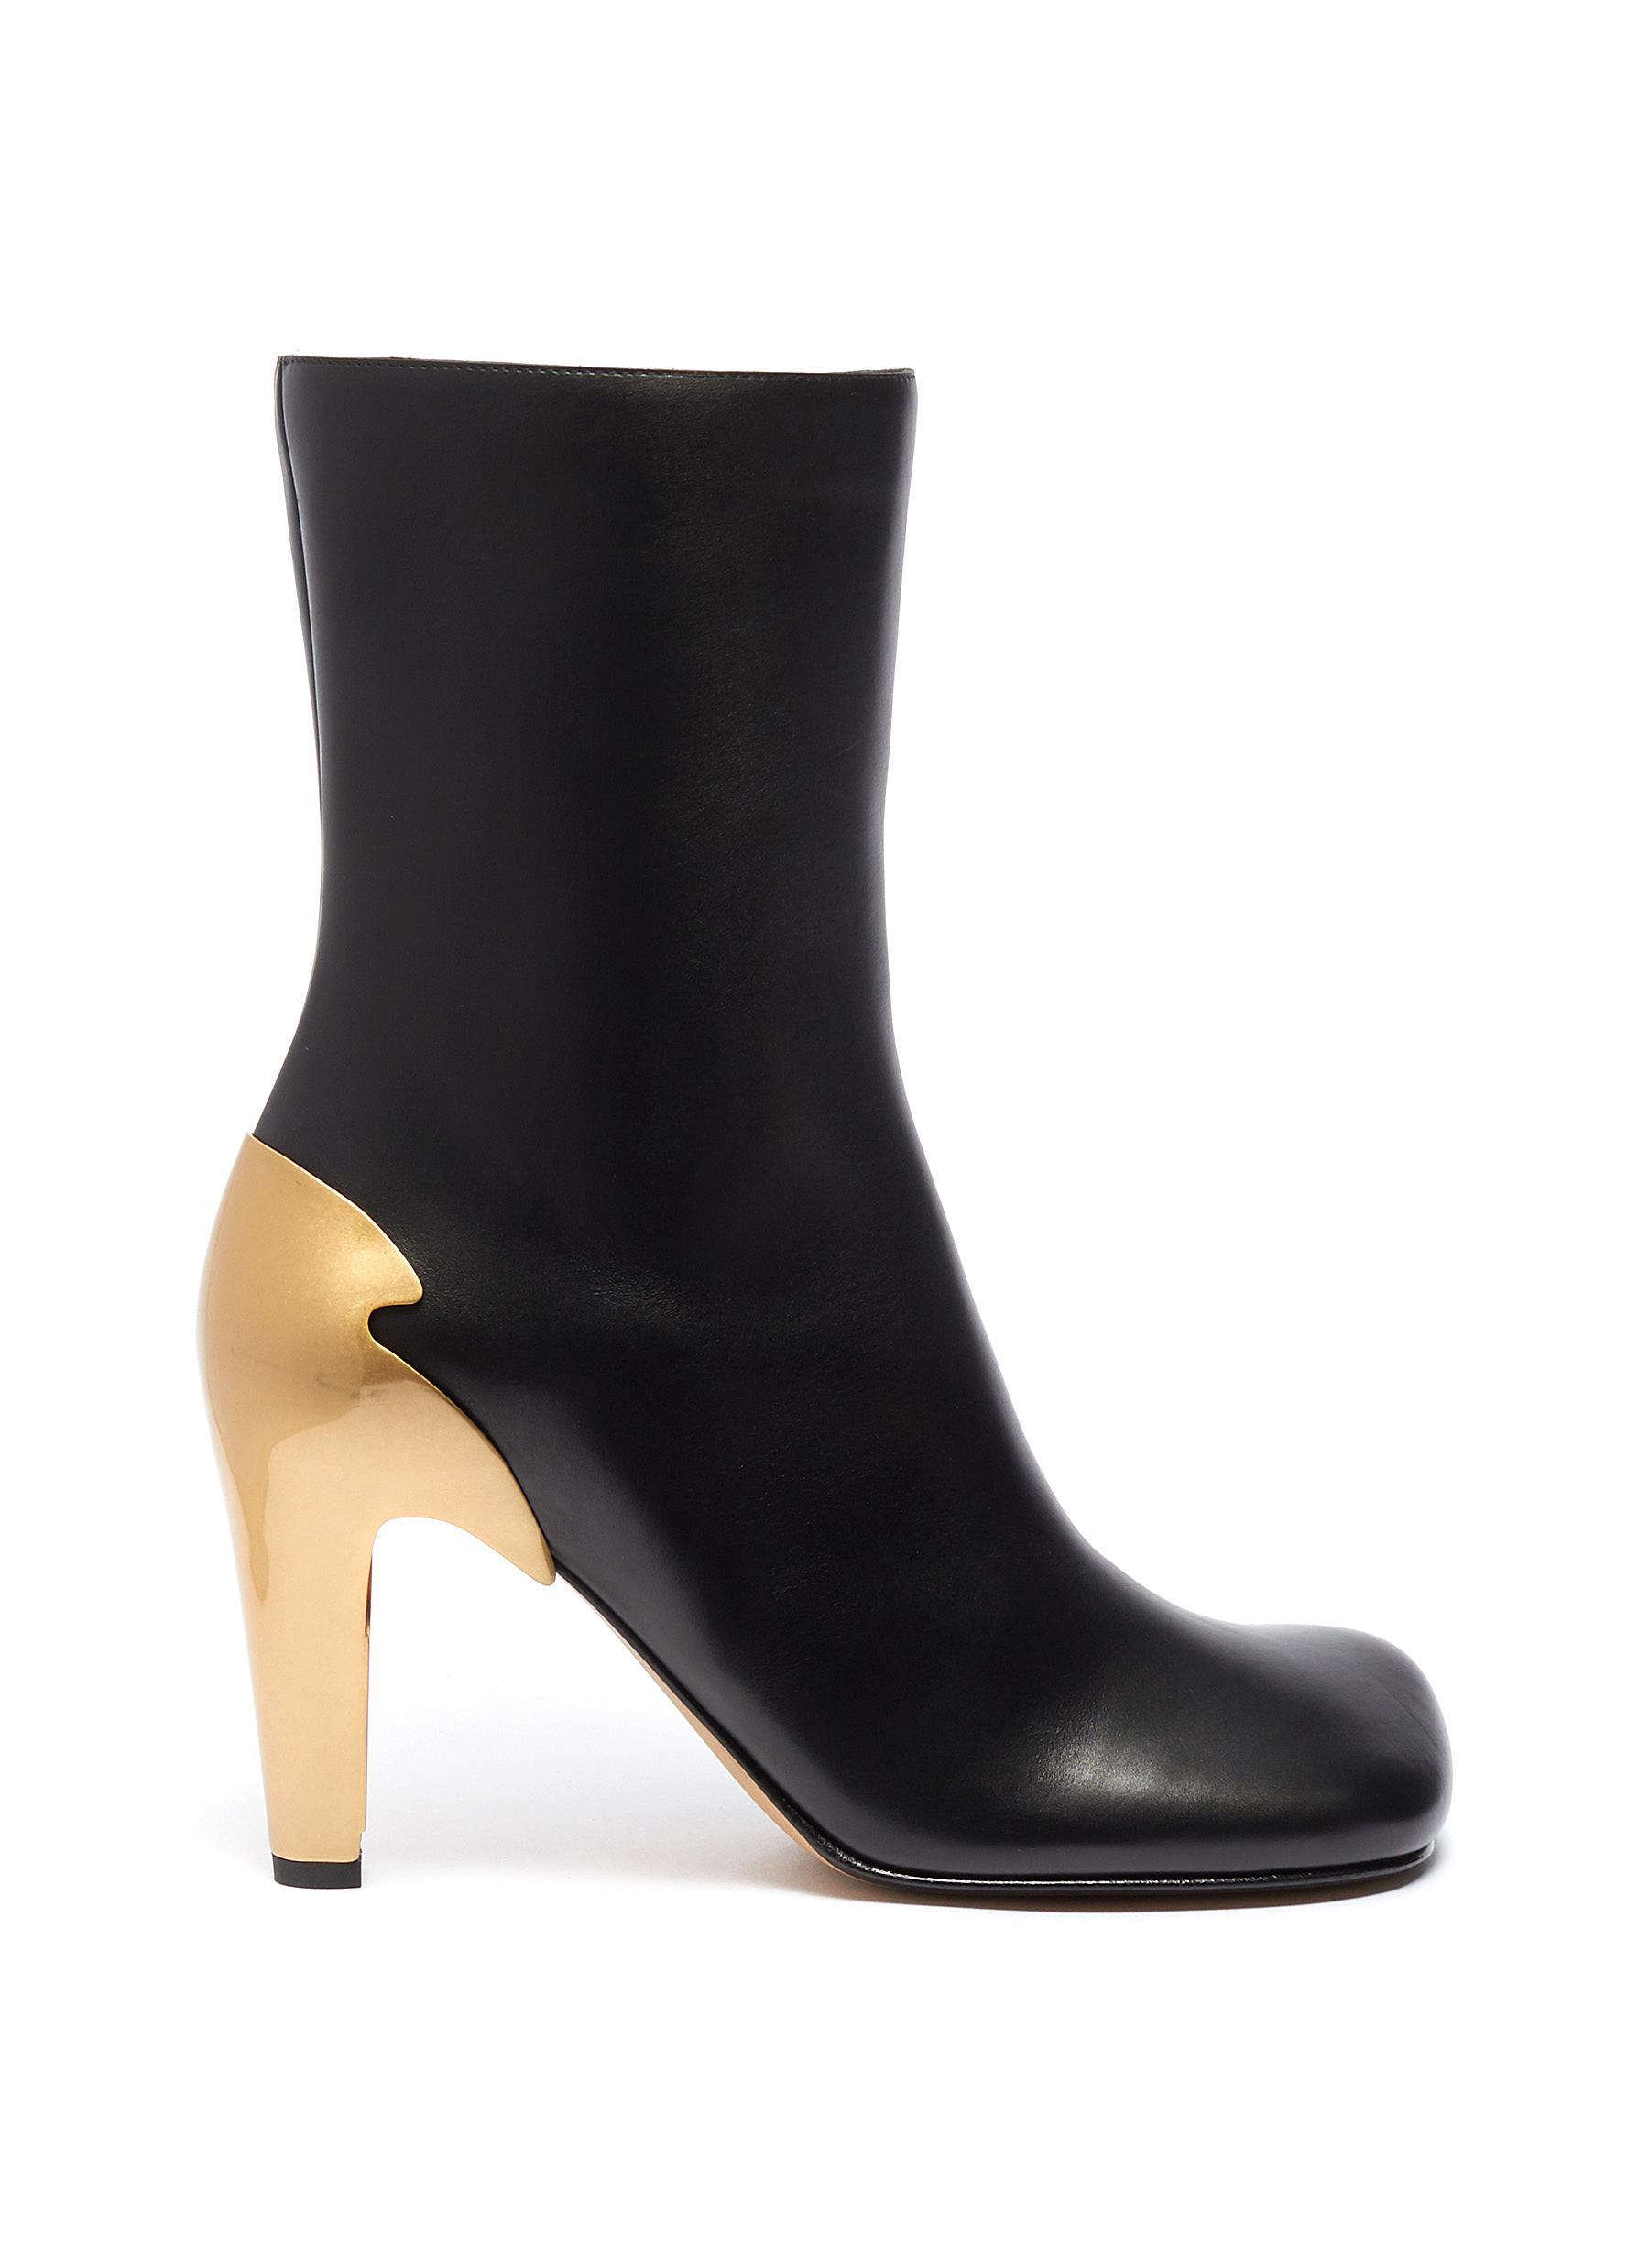 Bottega Veneta Boots Metal heel leather boots